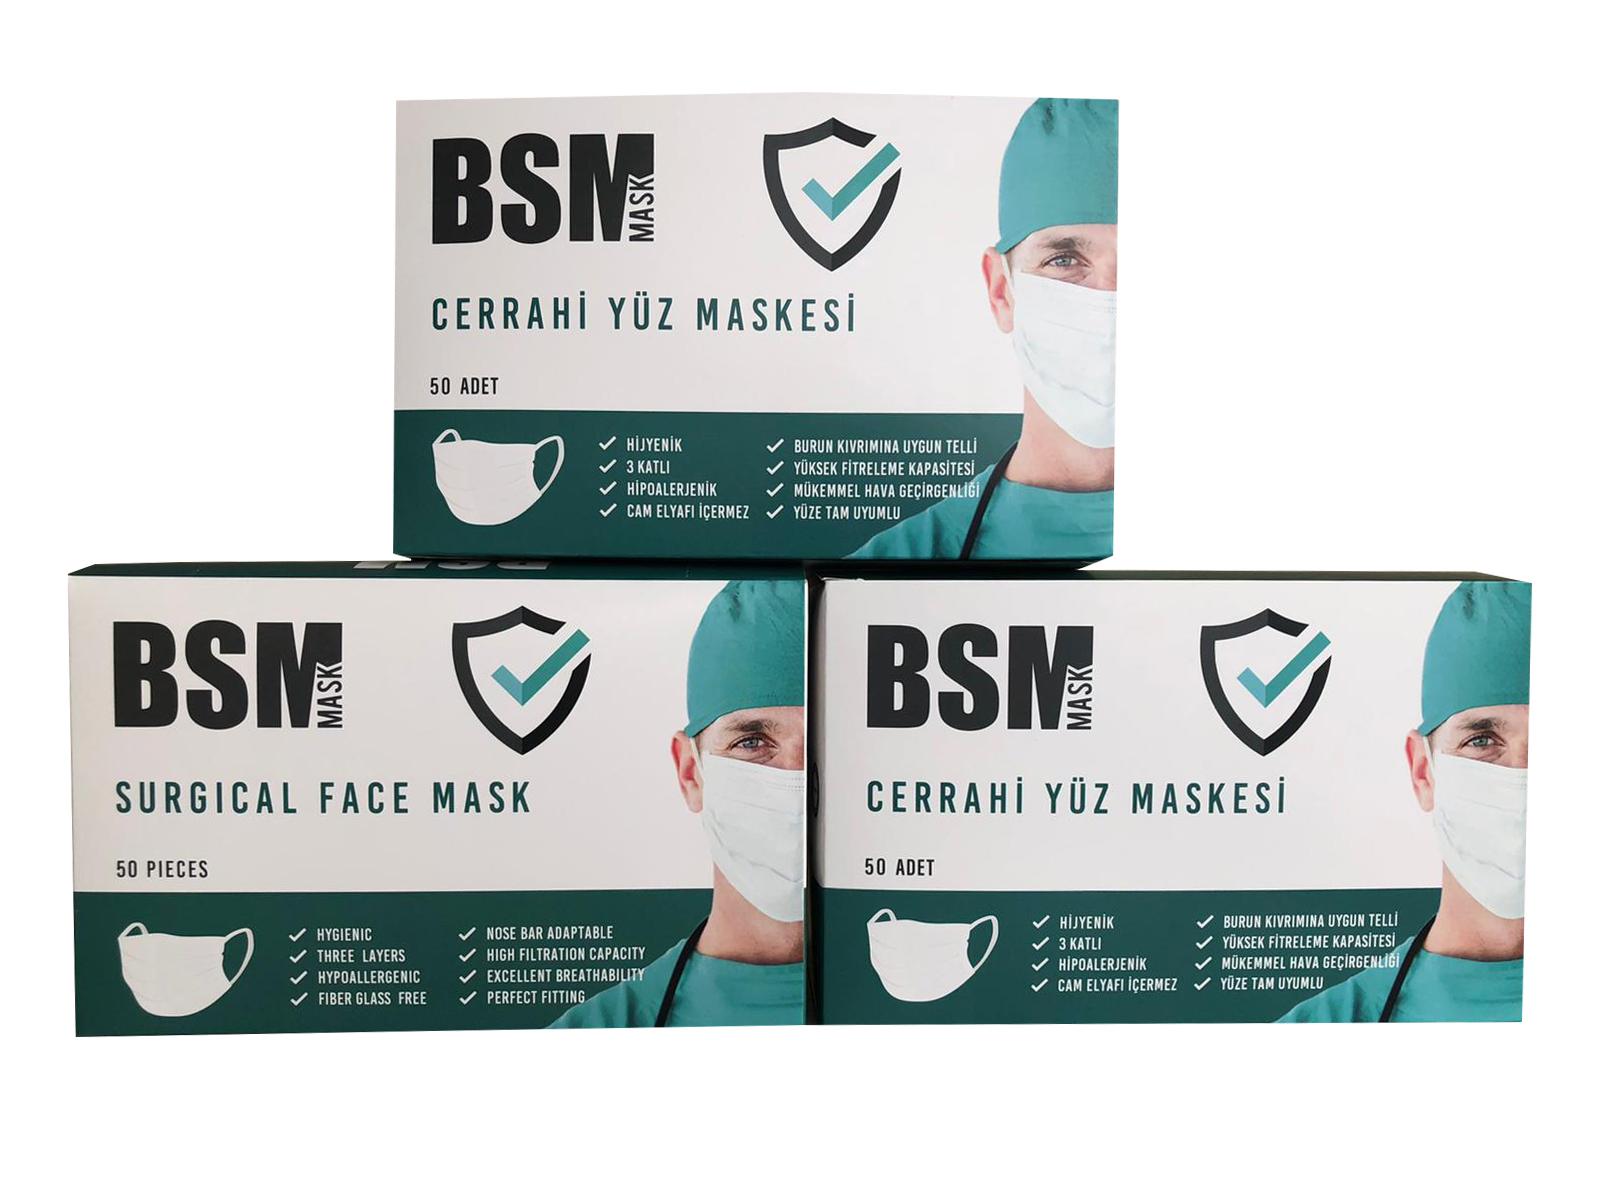 BSM YEŞİL 3 Katlı Yassı Lastikli Cerrahi Maske Toplam 150 Adet